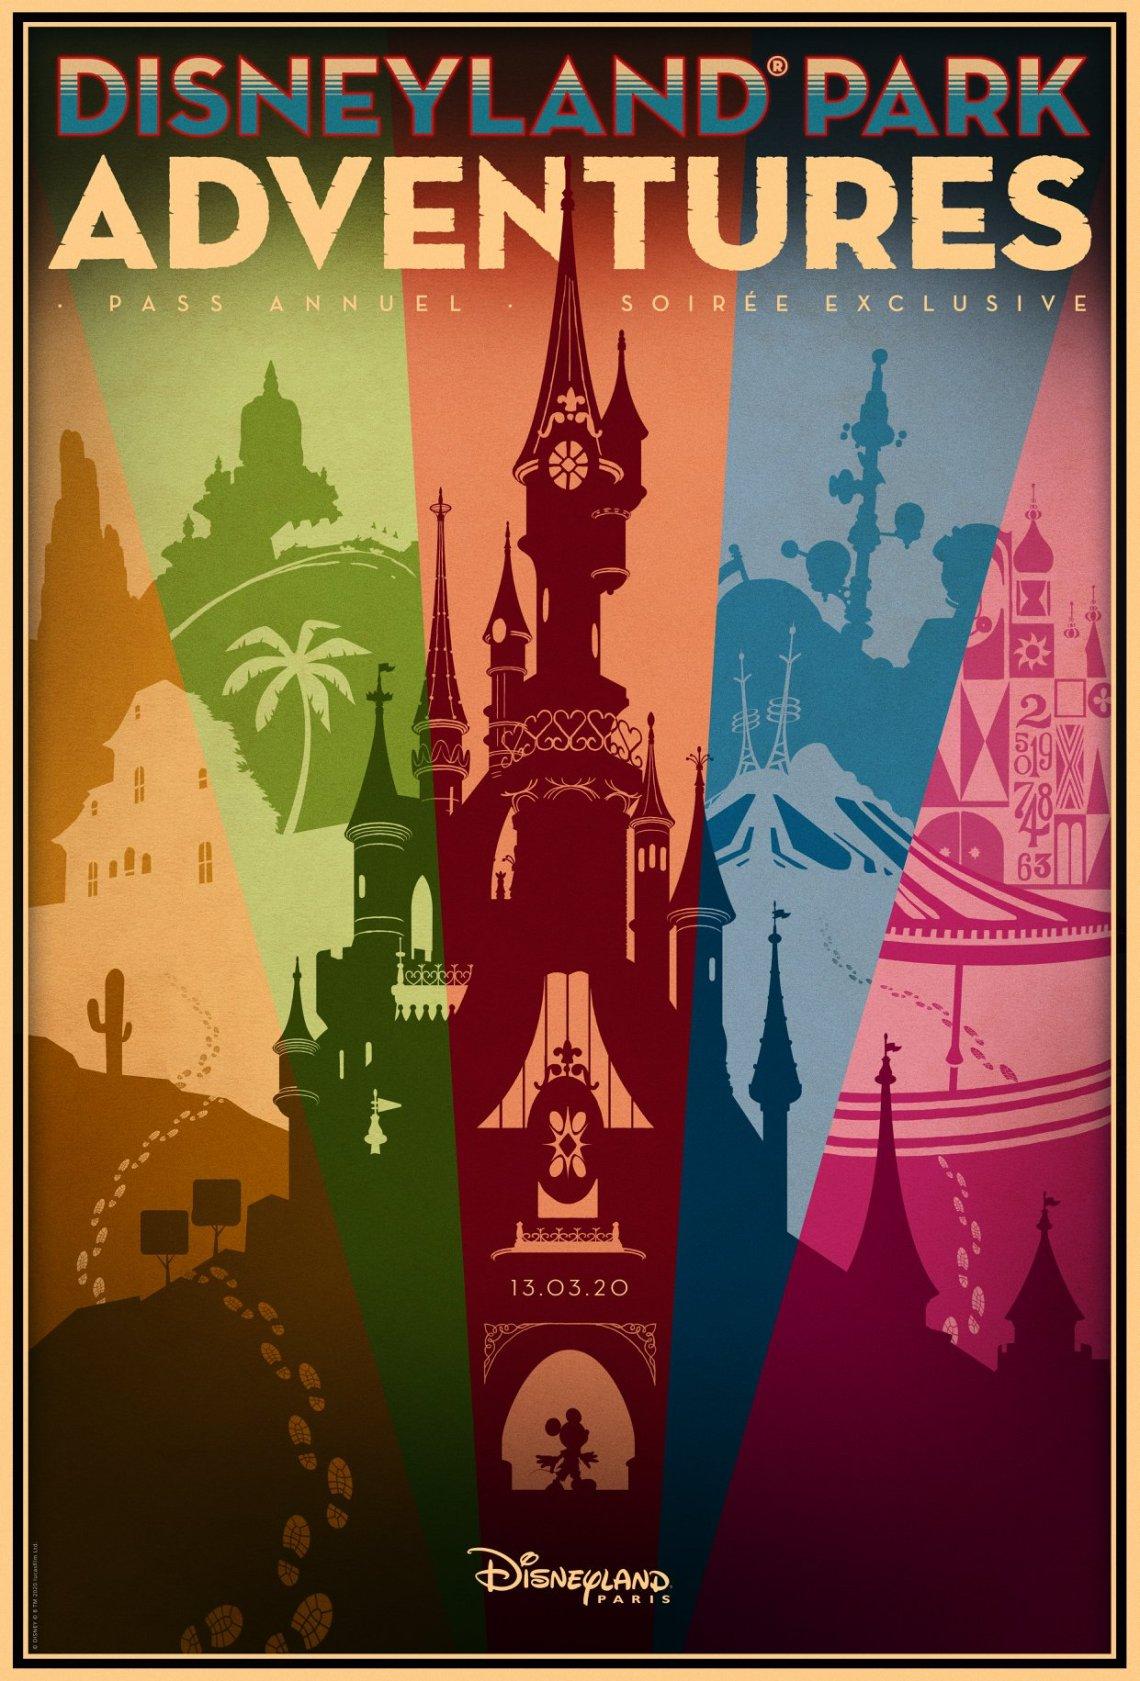 soirée pass annuel disneyland paris mars 2020